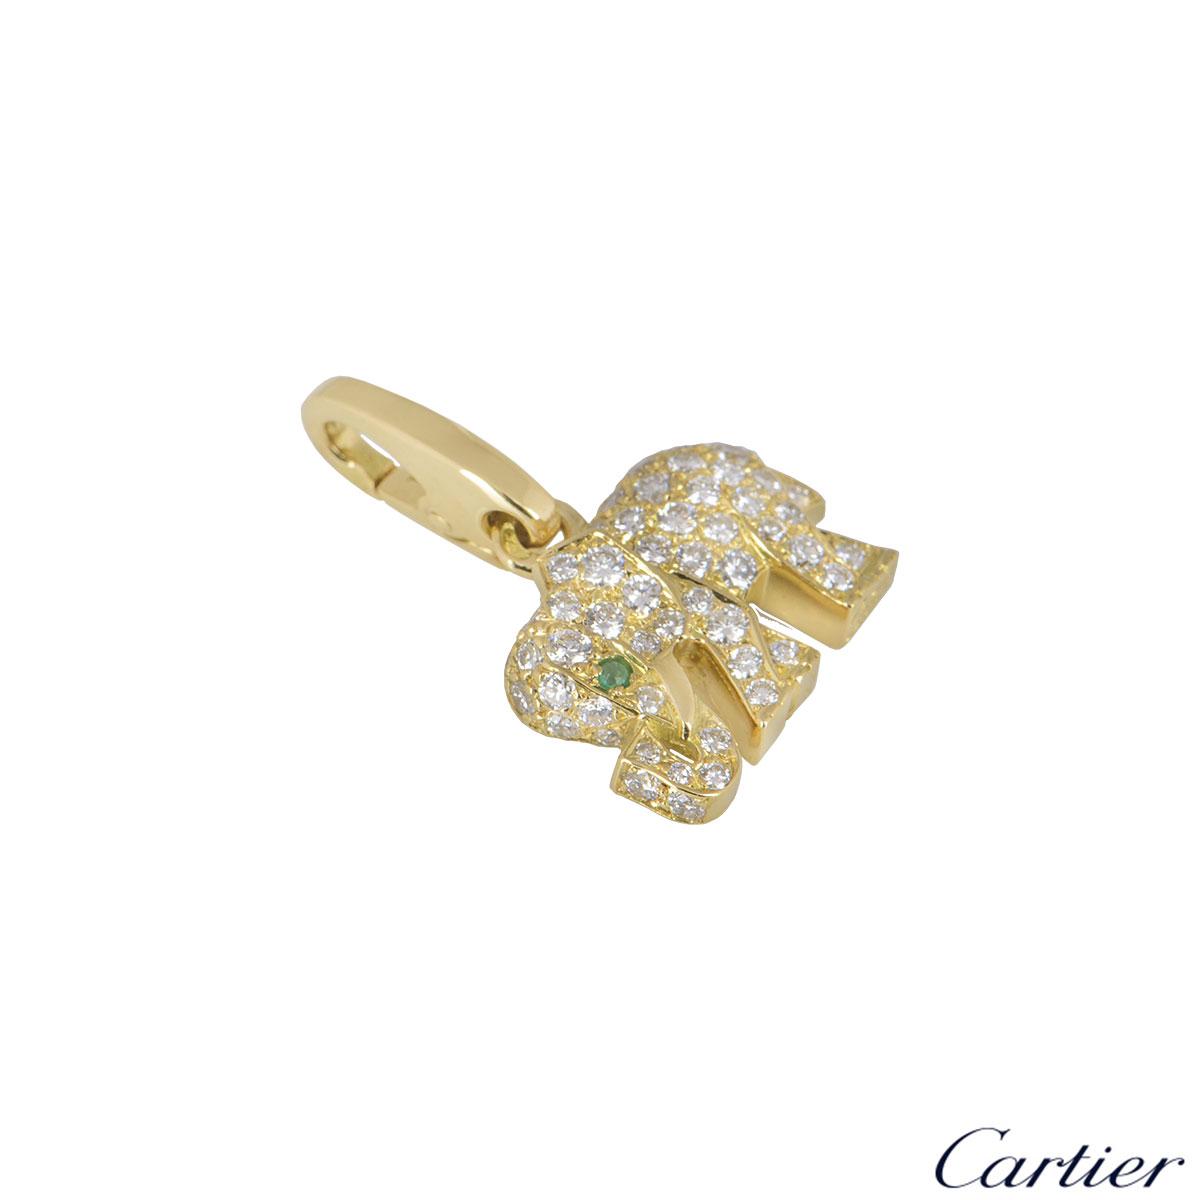 Cartier Yellow Gold Diamond Elephant Charm